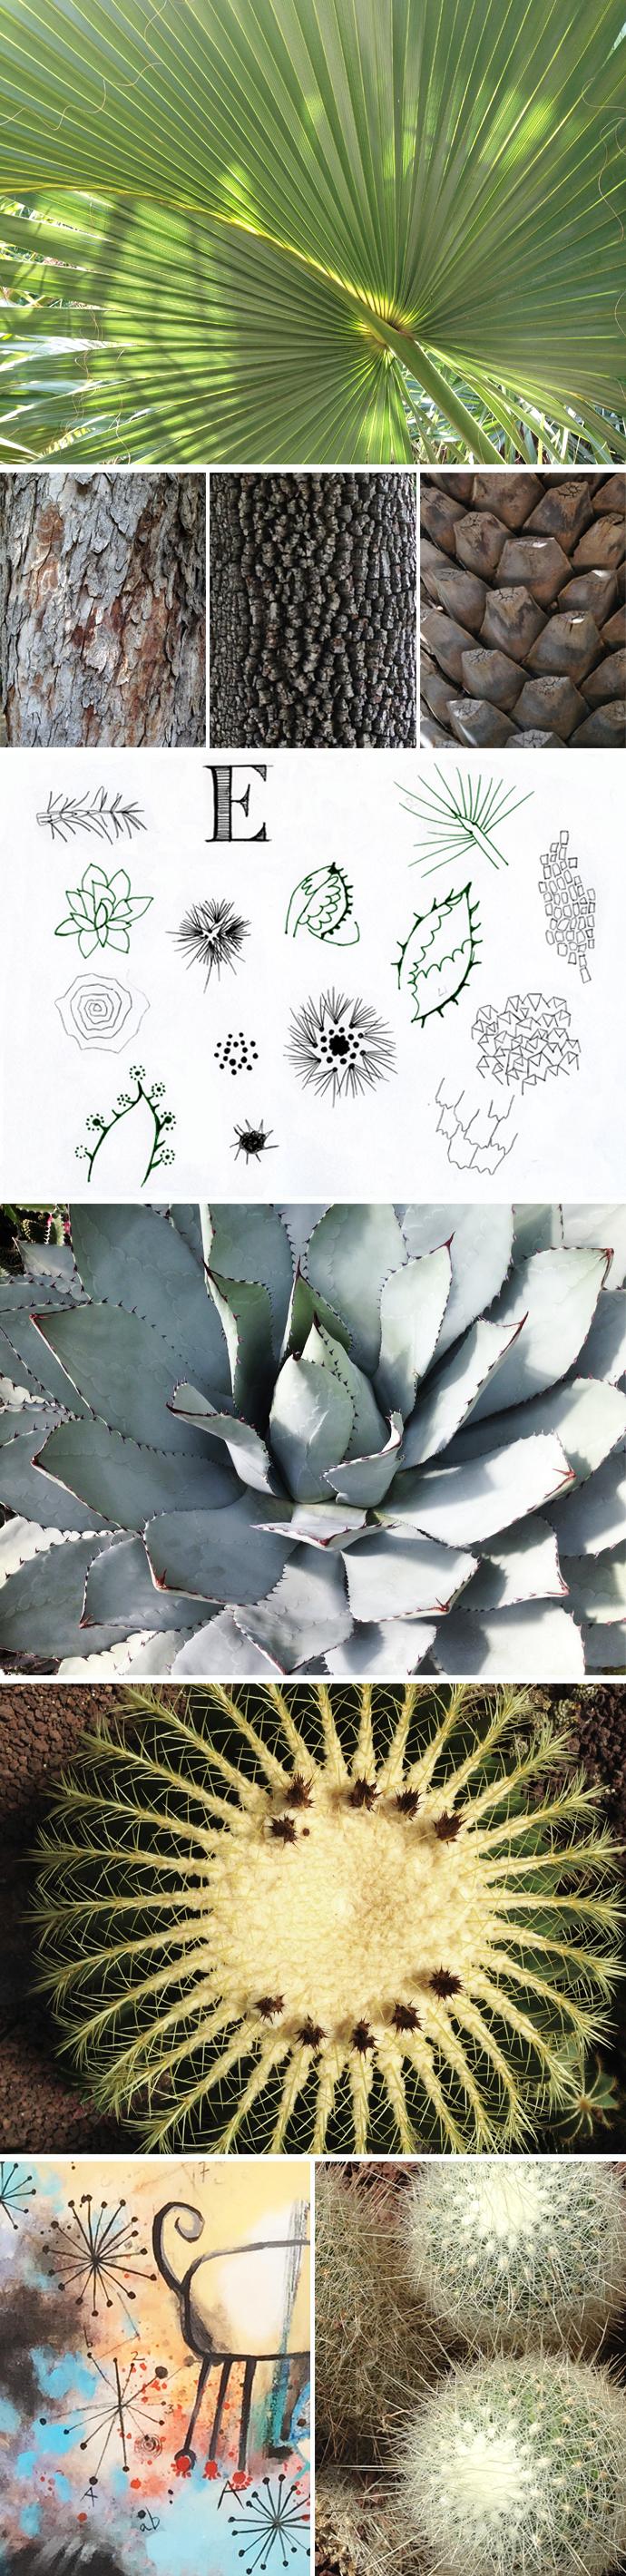 botanico-2